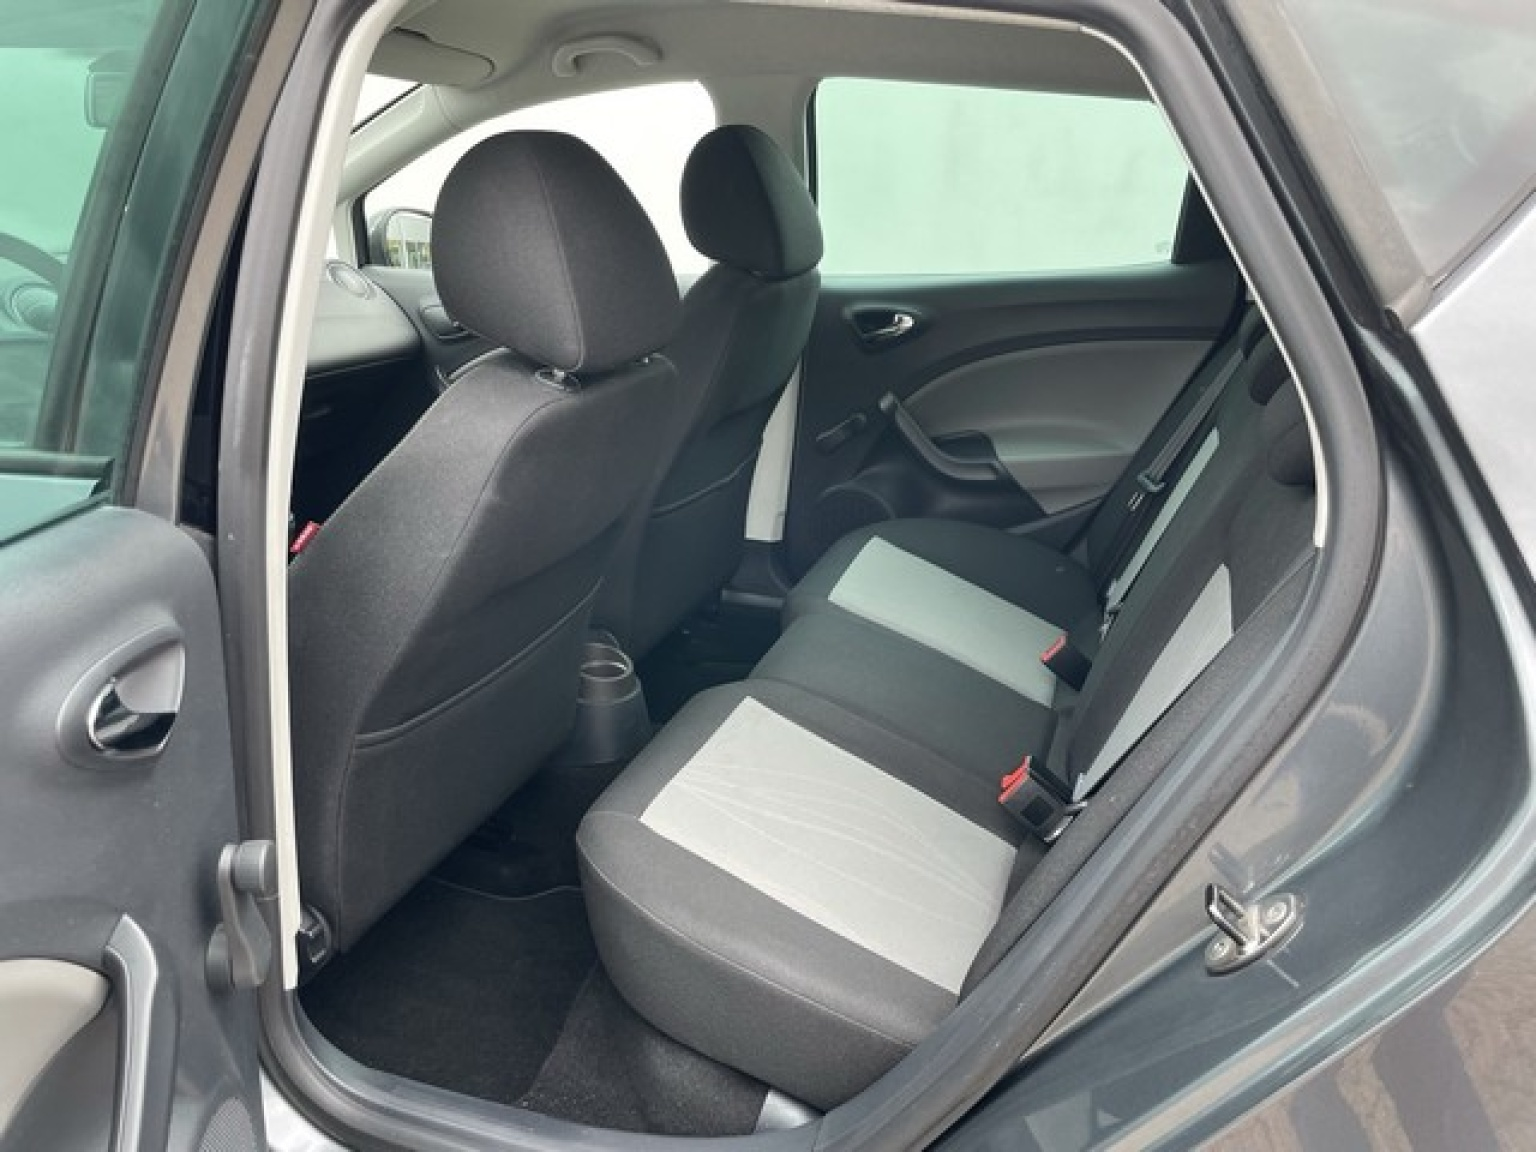 SEAT-Ibiza-11